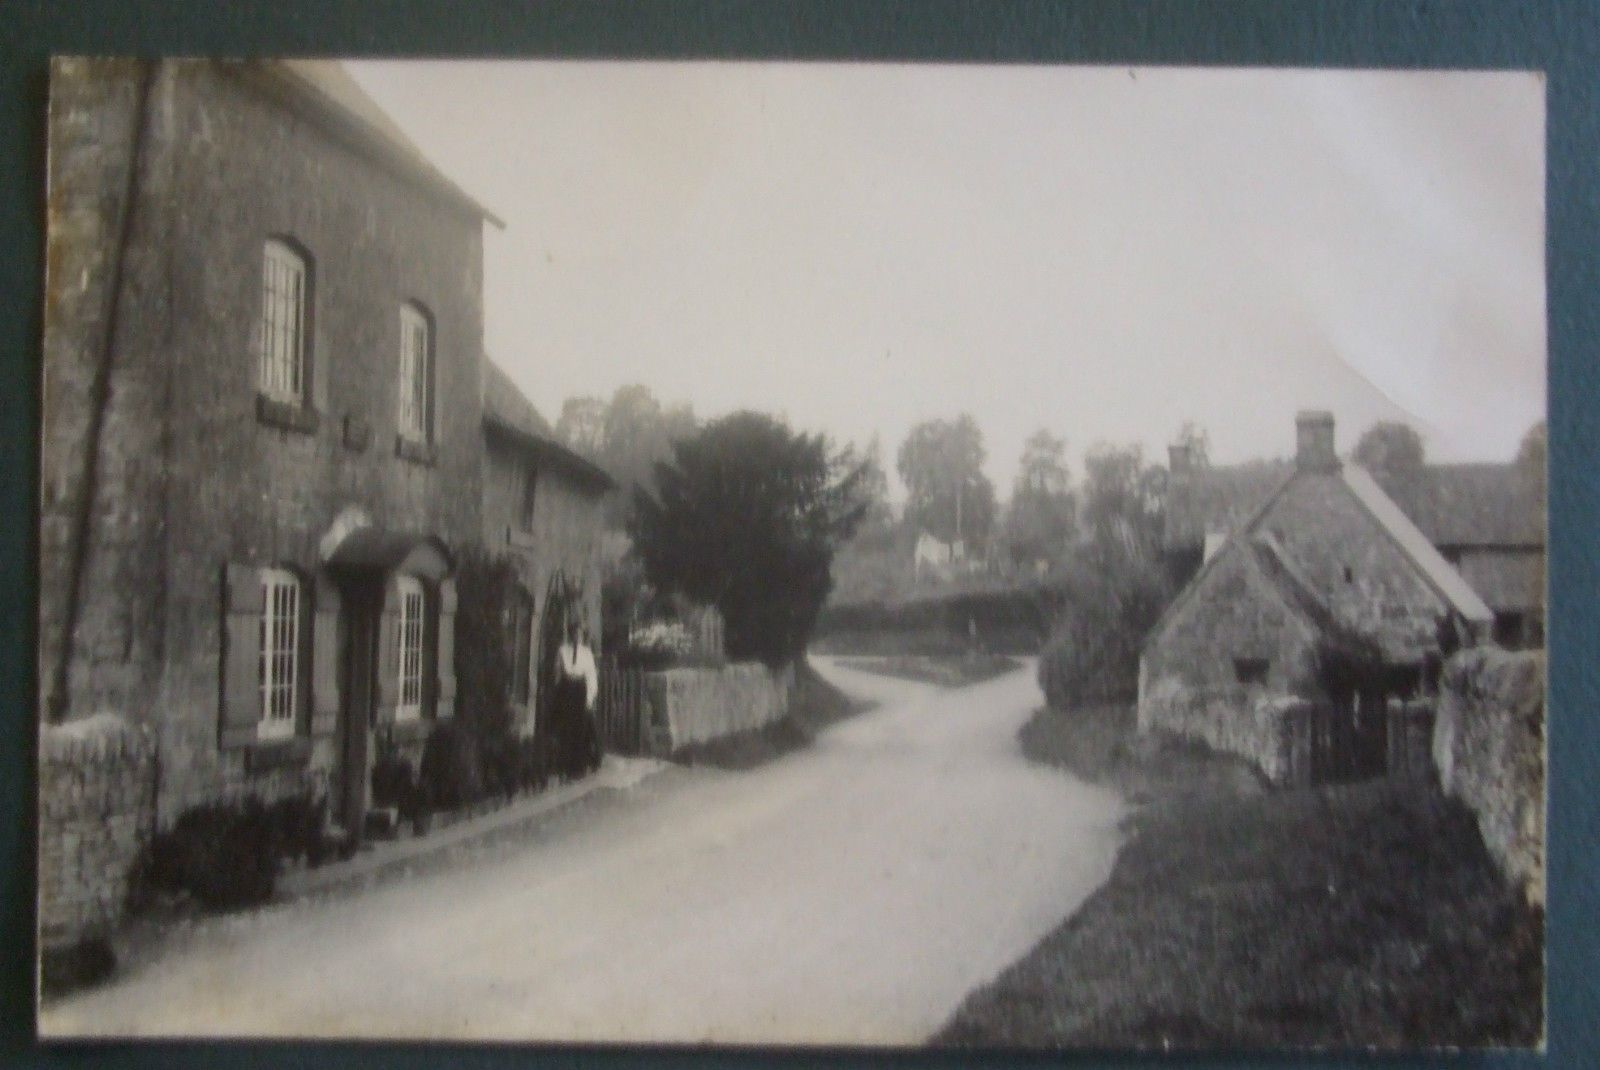 FRANK PACKER RP Postcard c.1920 UNIDENTIFIED VILLAGE STREET SCENE,OXFORDSHIRE | eBay